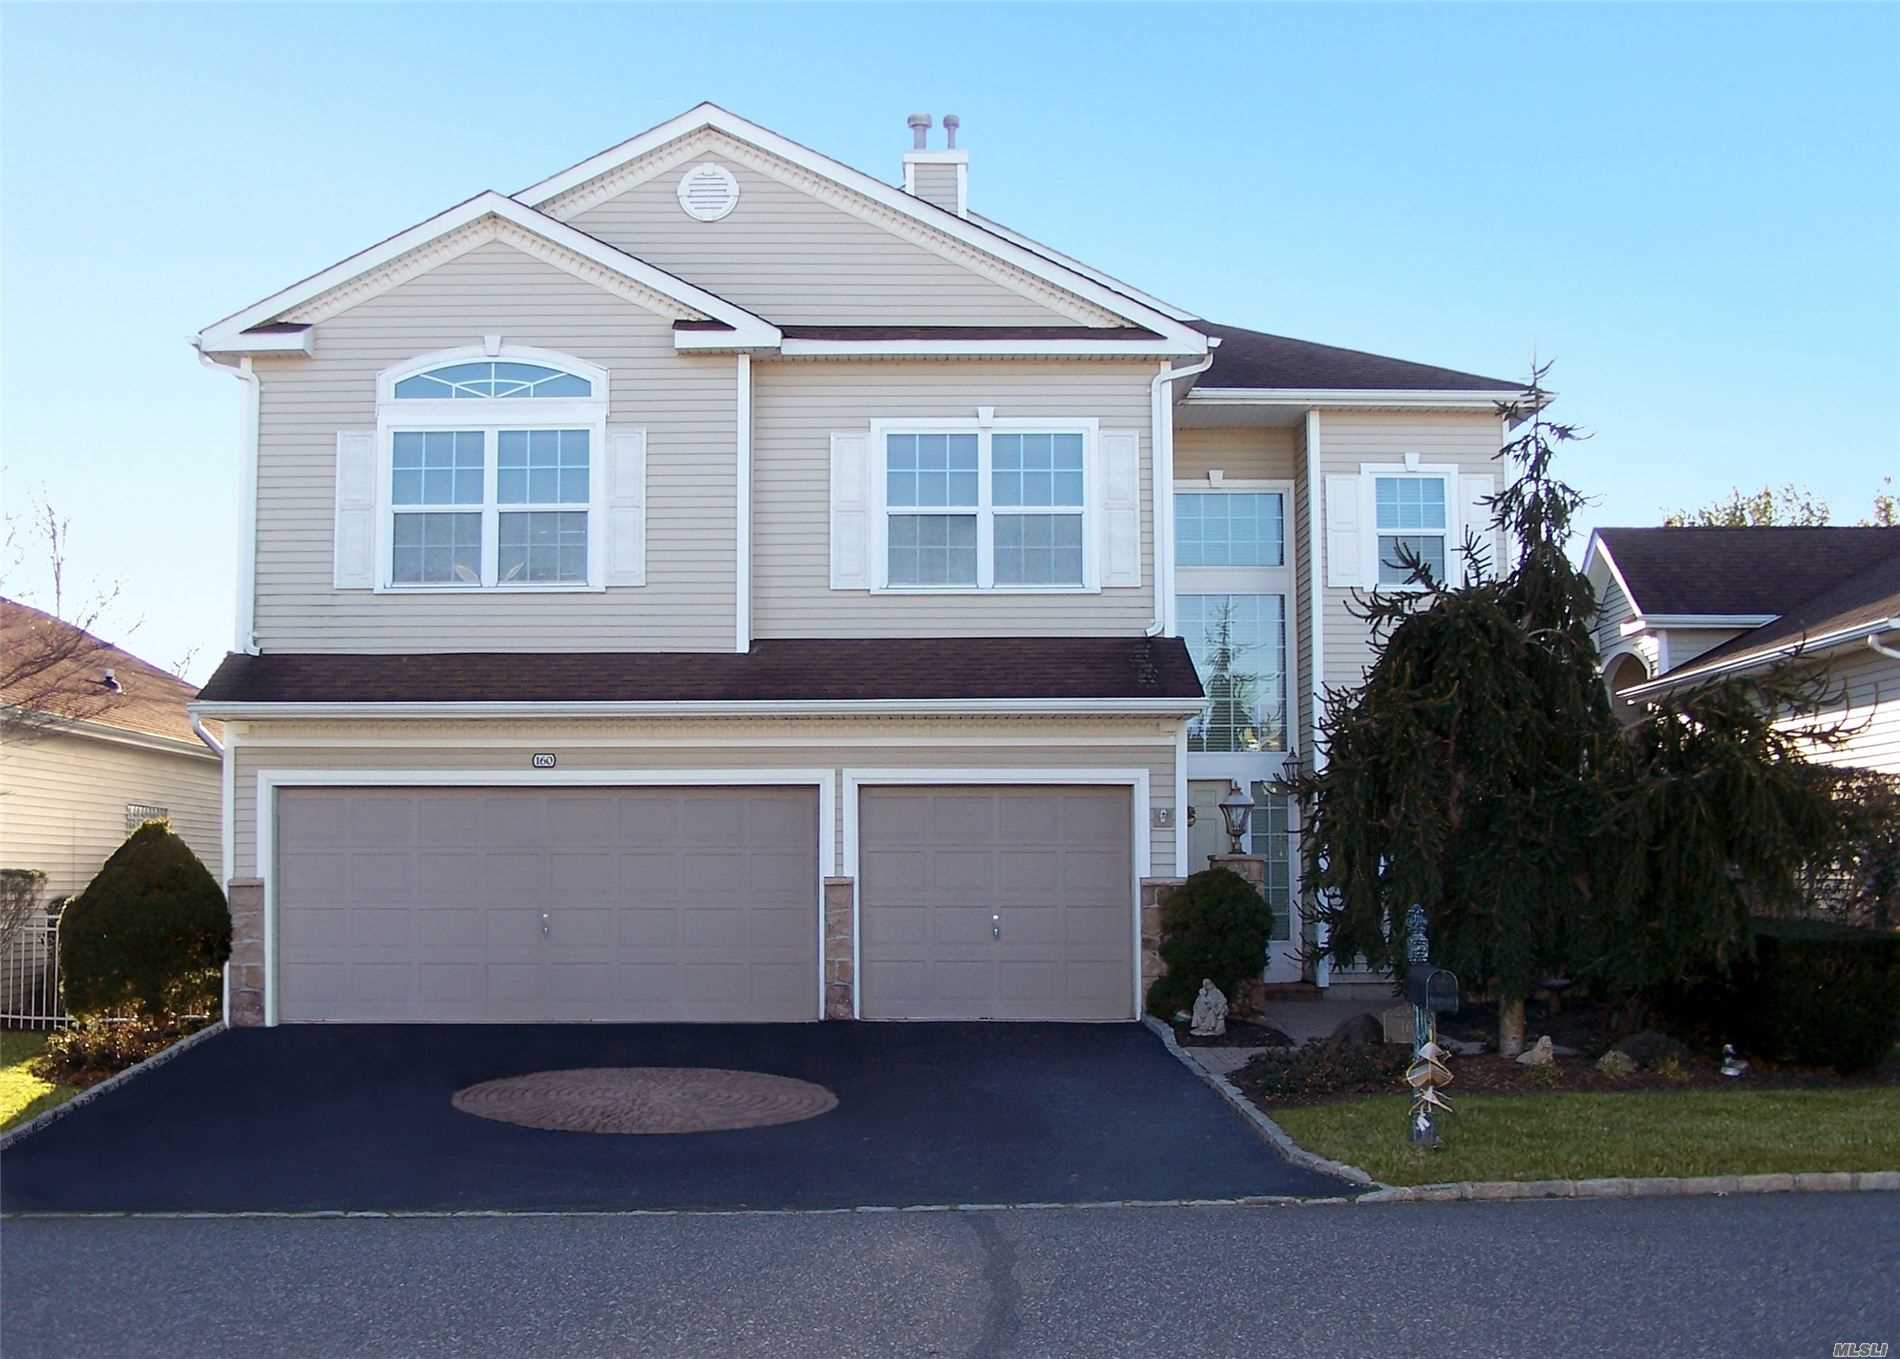 Property for sale at 160 Hamlet Drive, Mt. Sinai NY 11766, Mt. Sinai,  New York 11766